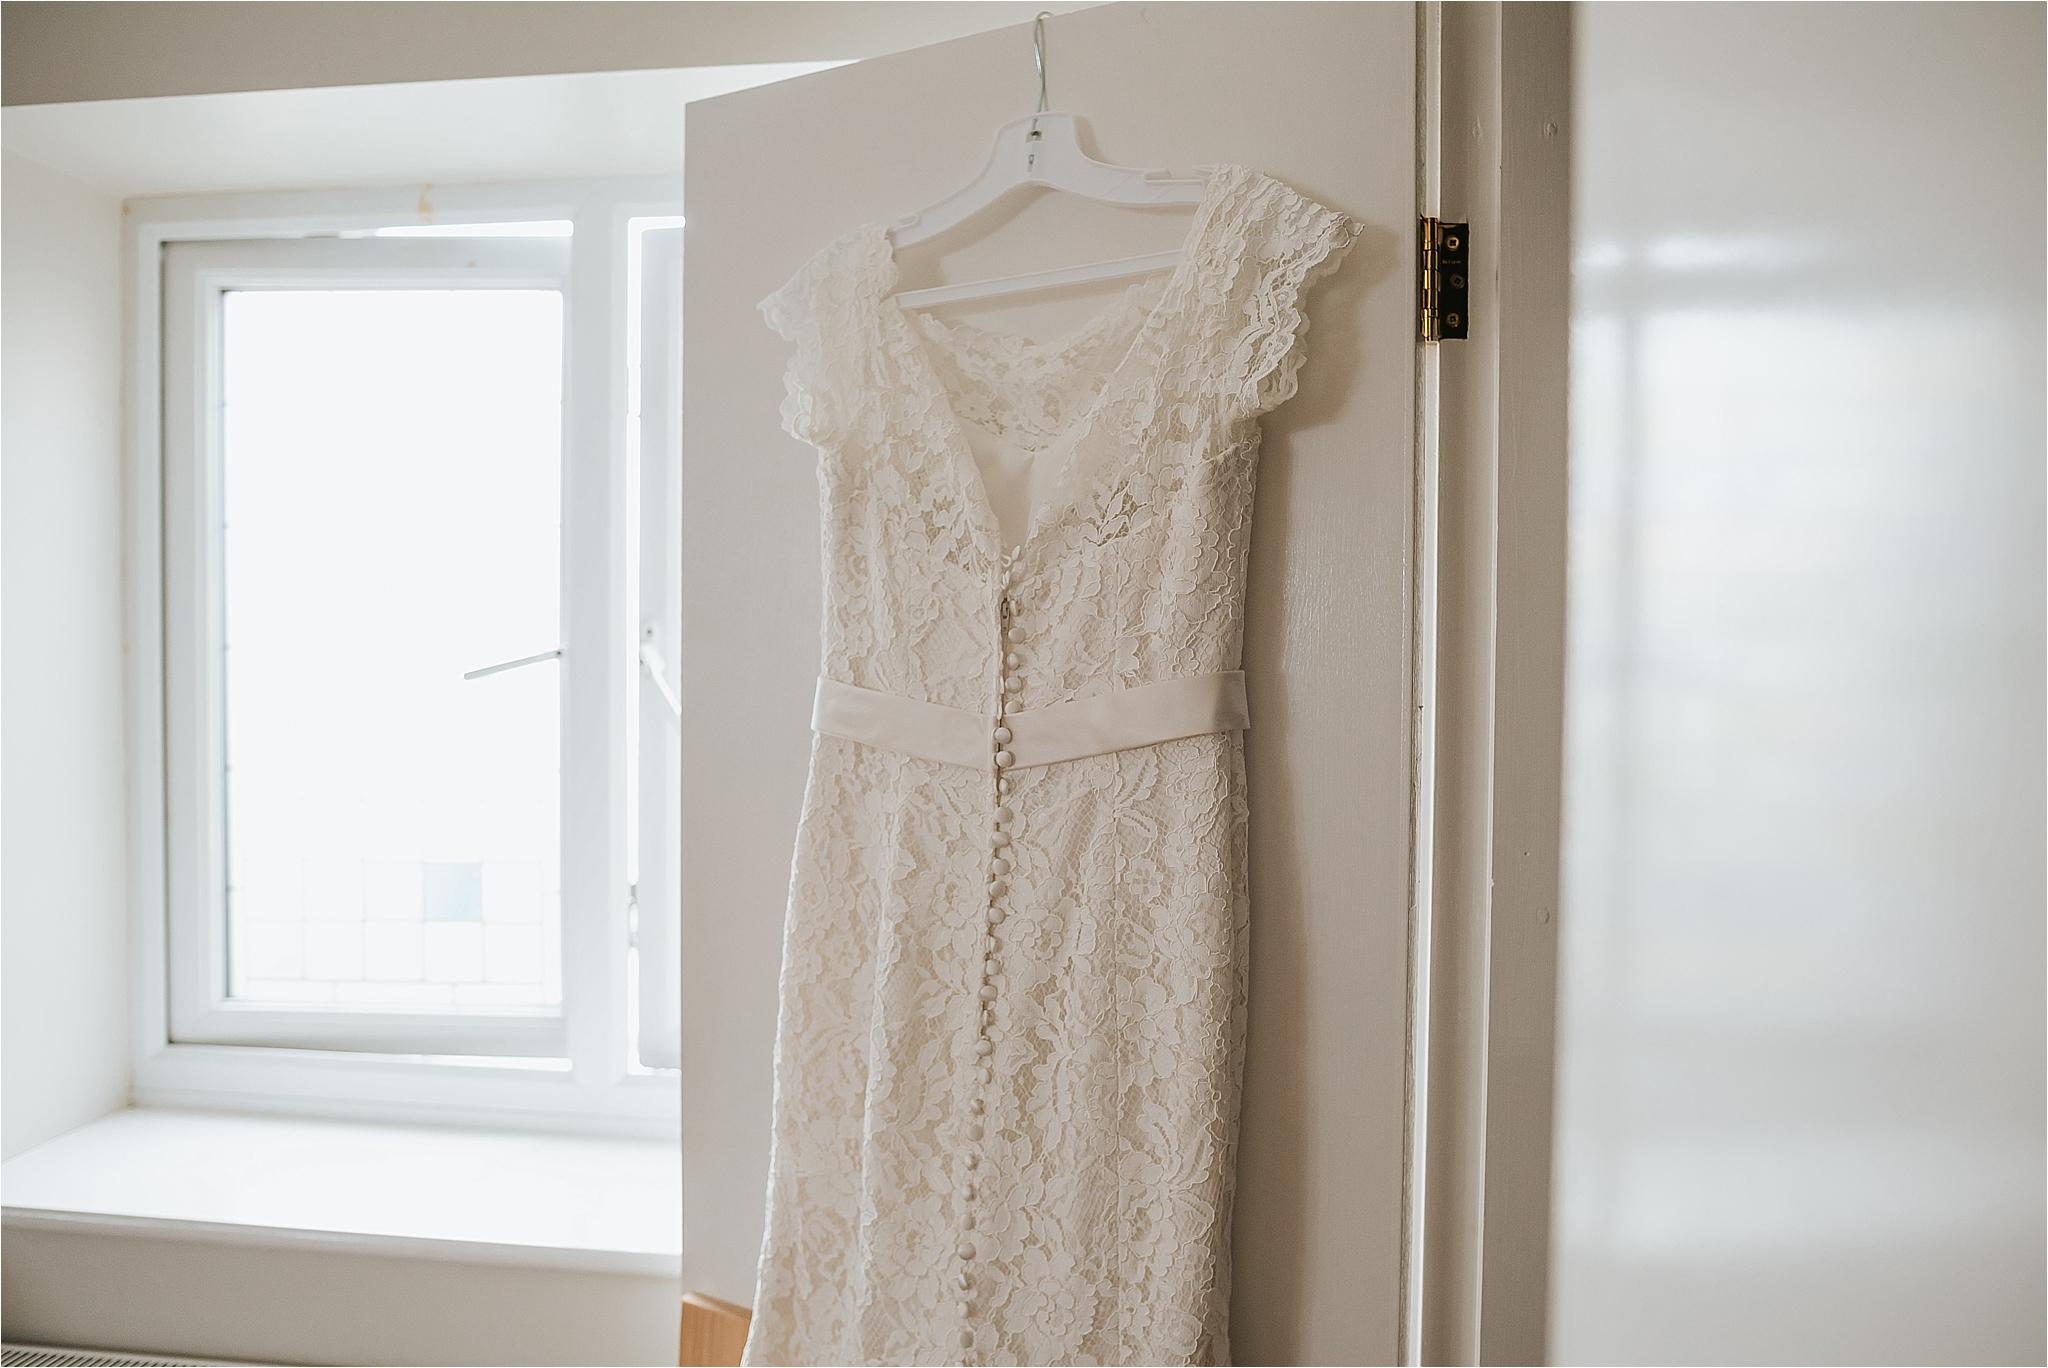 thevilla+lancashire+wreagreen+wedding+photographer78.jpg